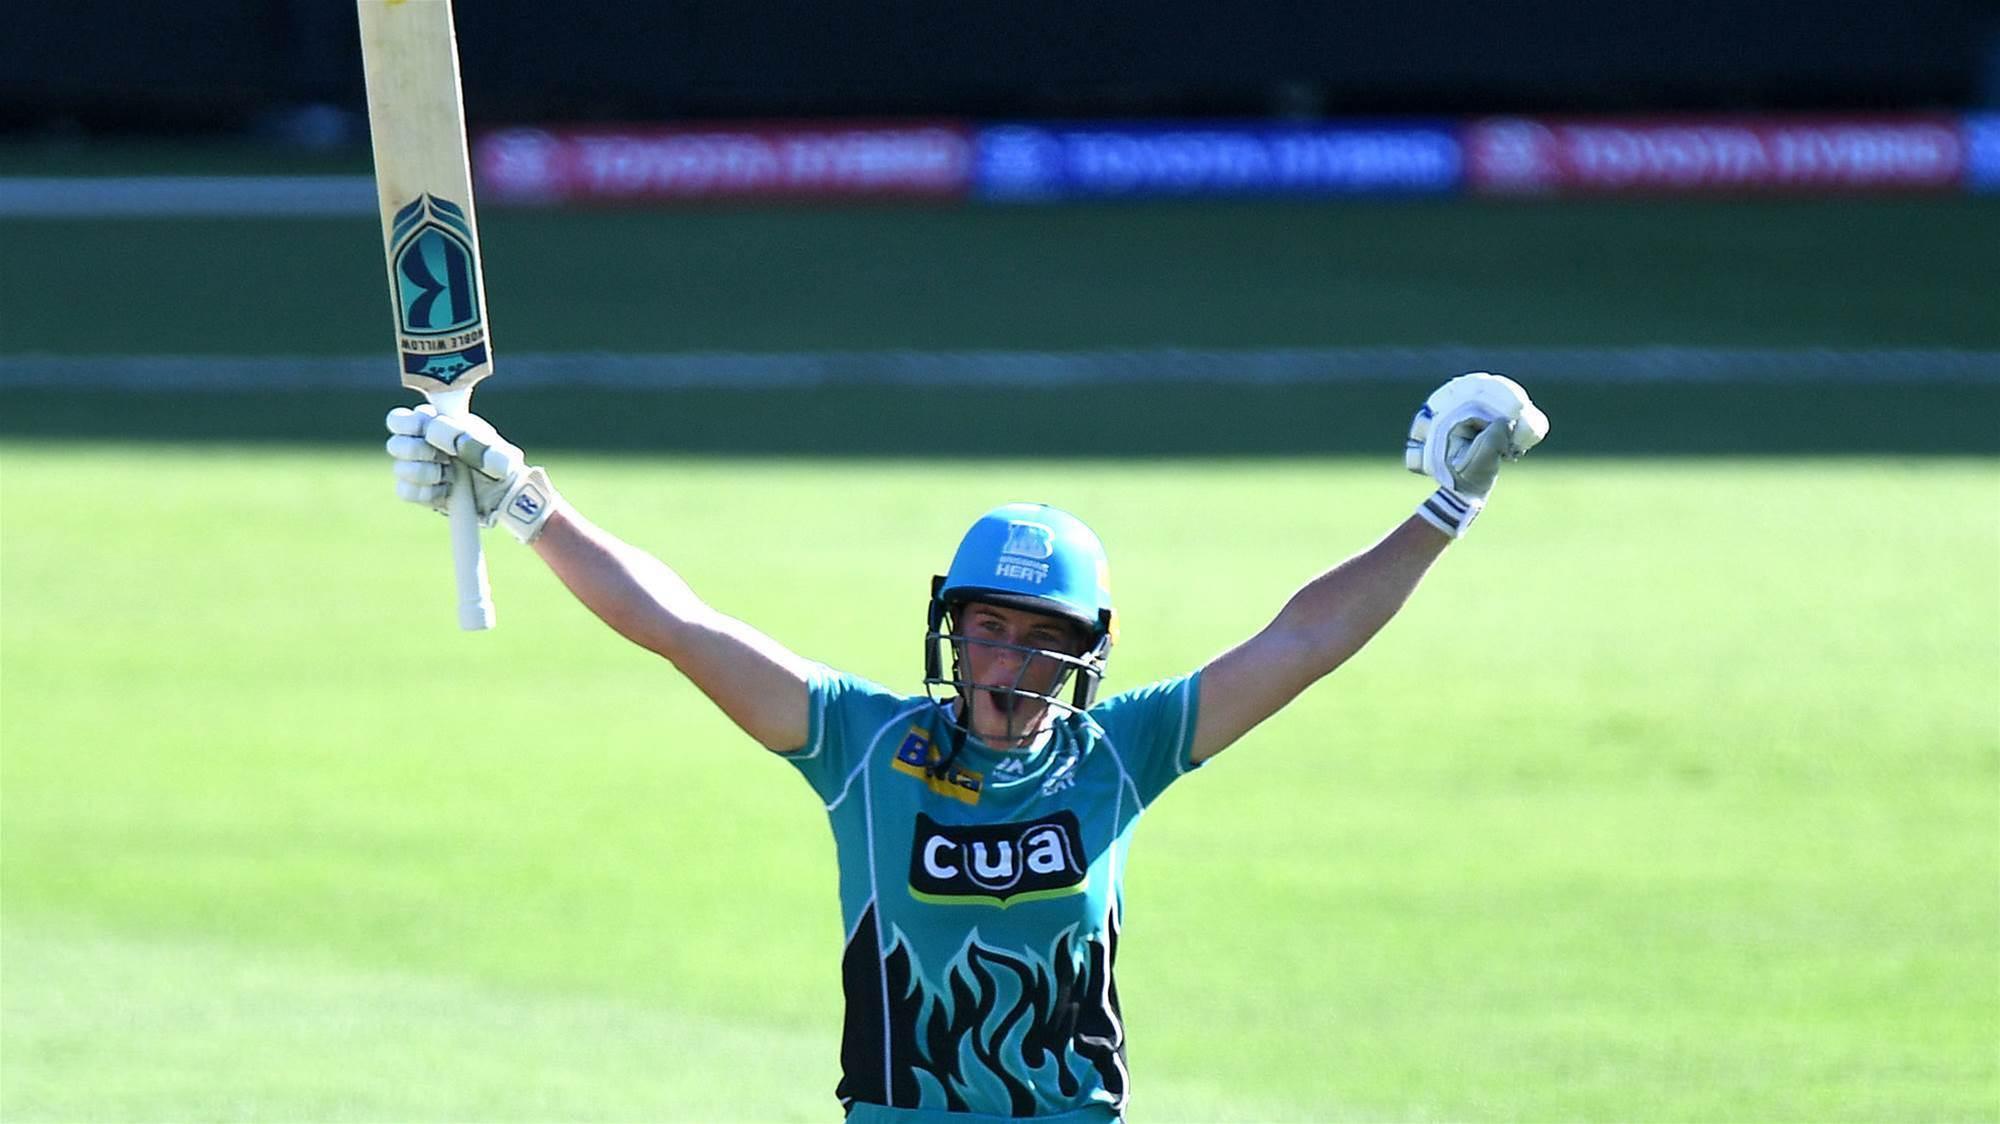 Watch Harris hit the fastest WBBL century